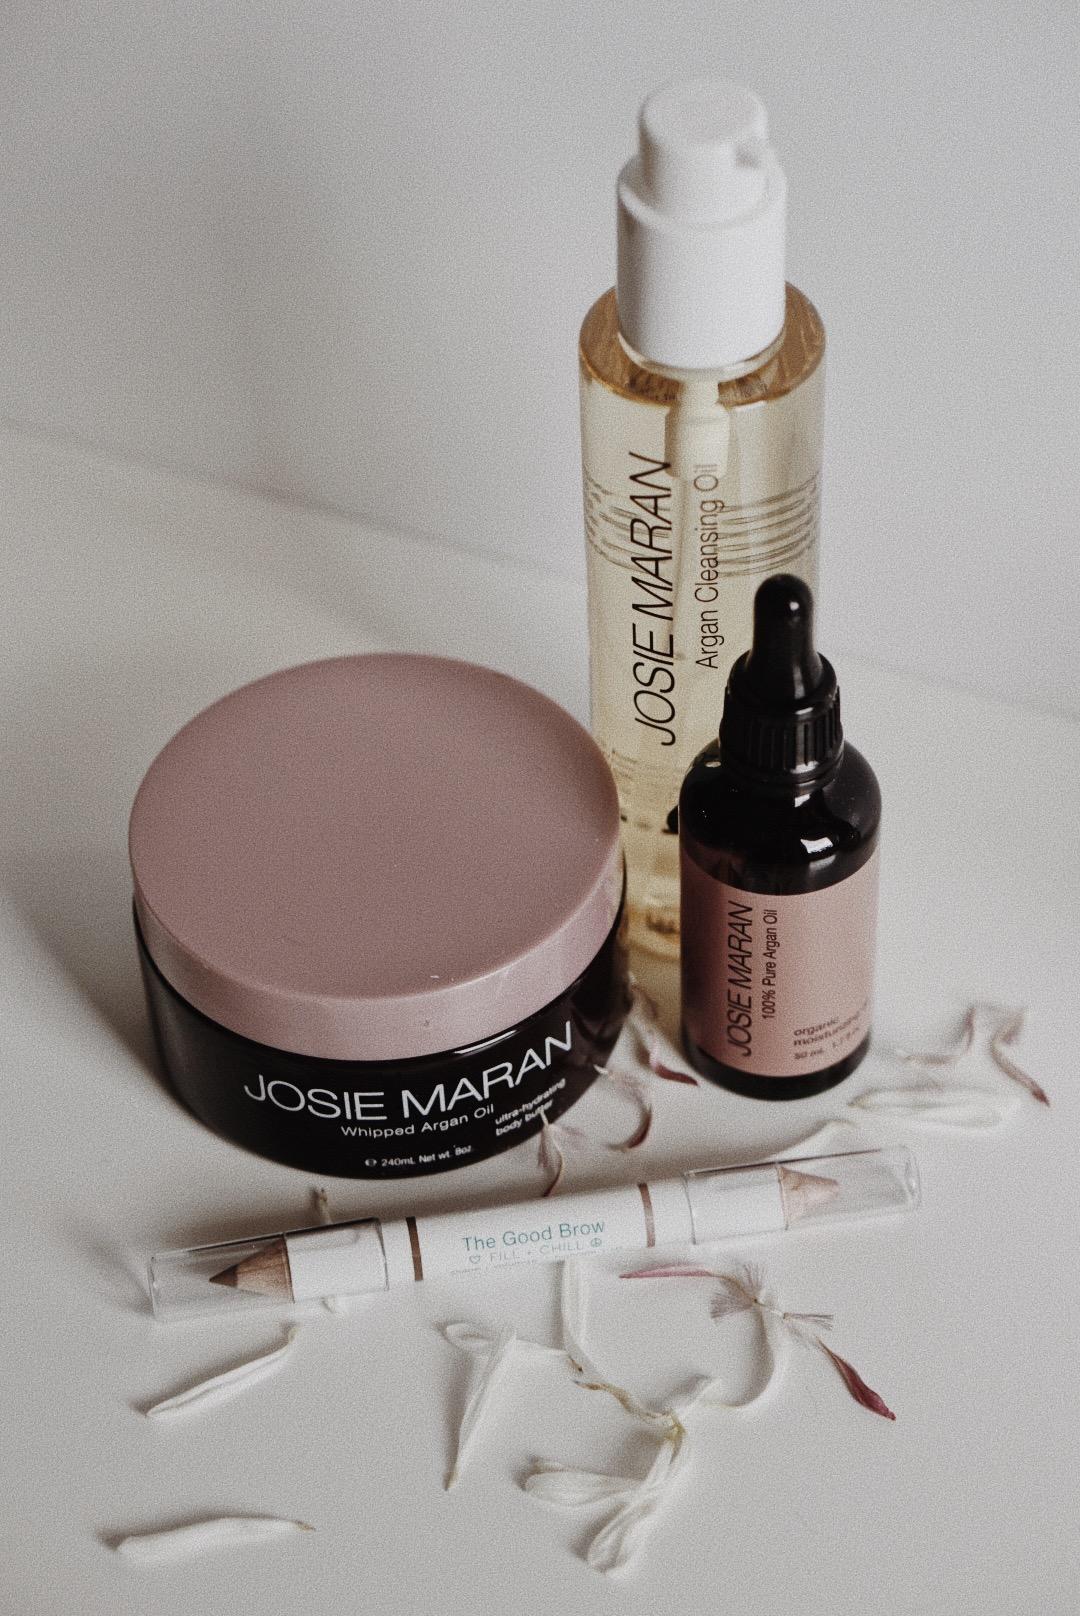 Josie Maran Argan Oil Skincare Products